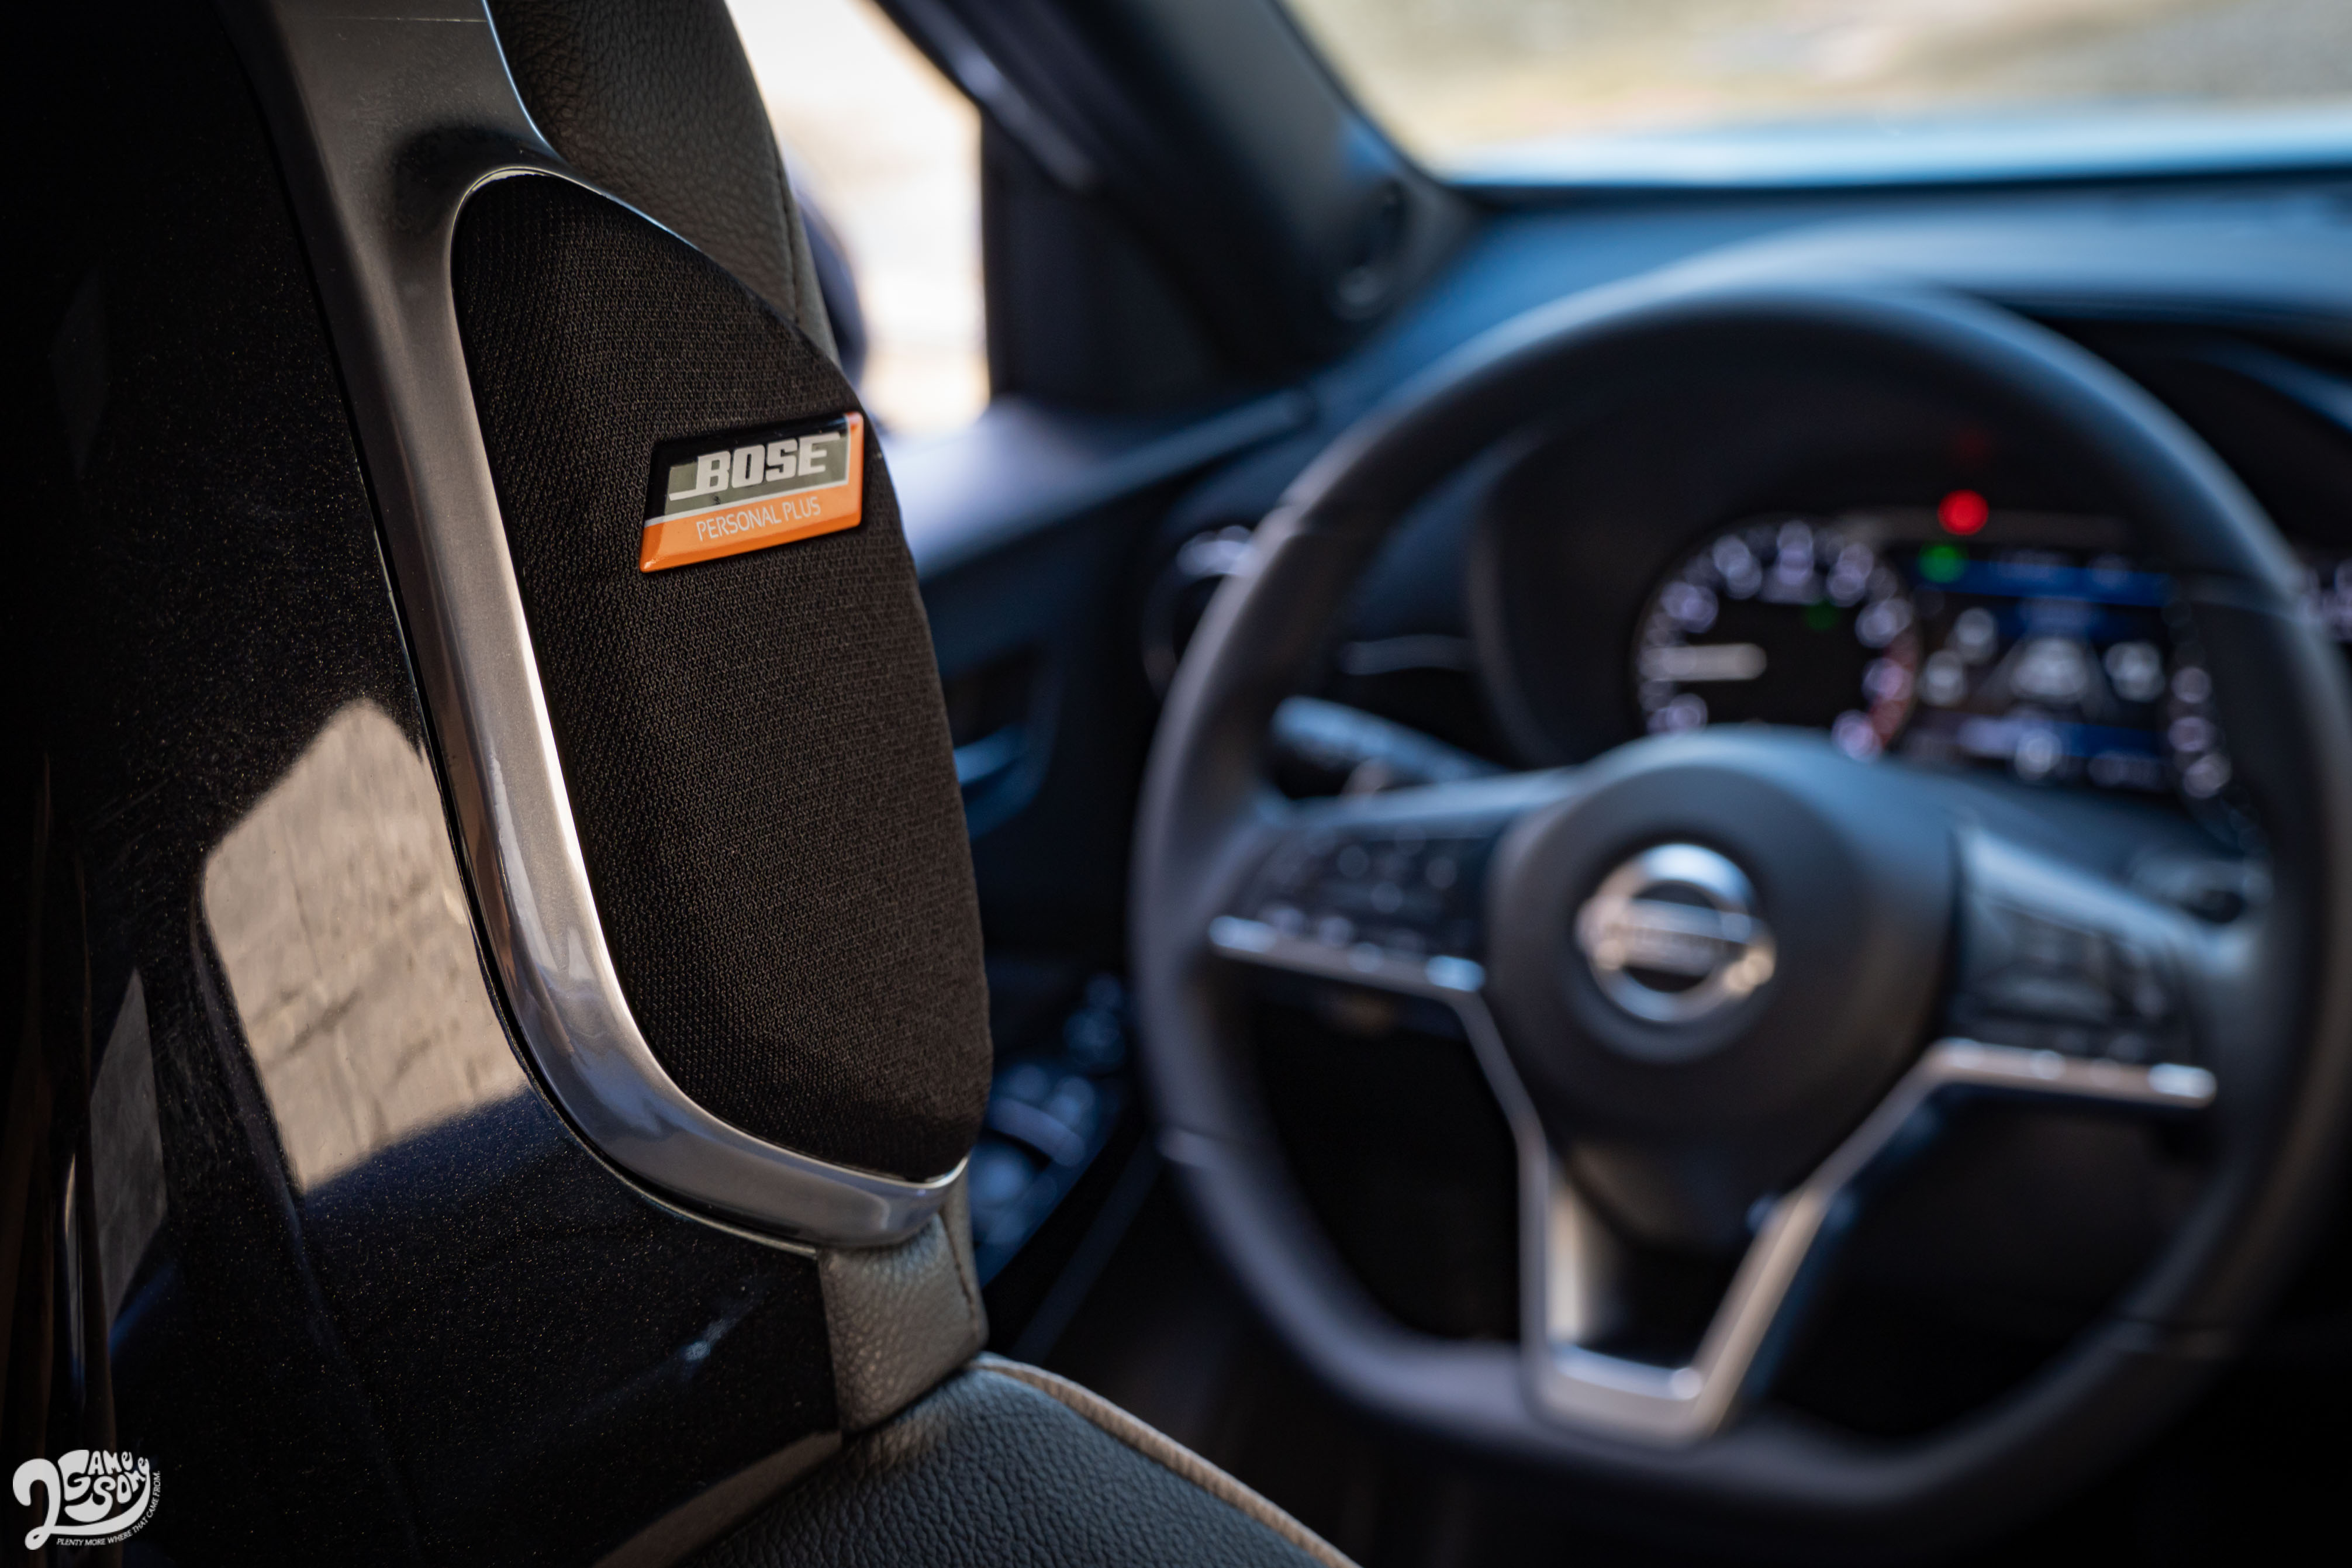 Bose Personal Plus 環繞音響除了可以 180 度調整前座音場,前座頭枕兩側還有 Ultra Nearfield 超近音場揚聲器加分。